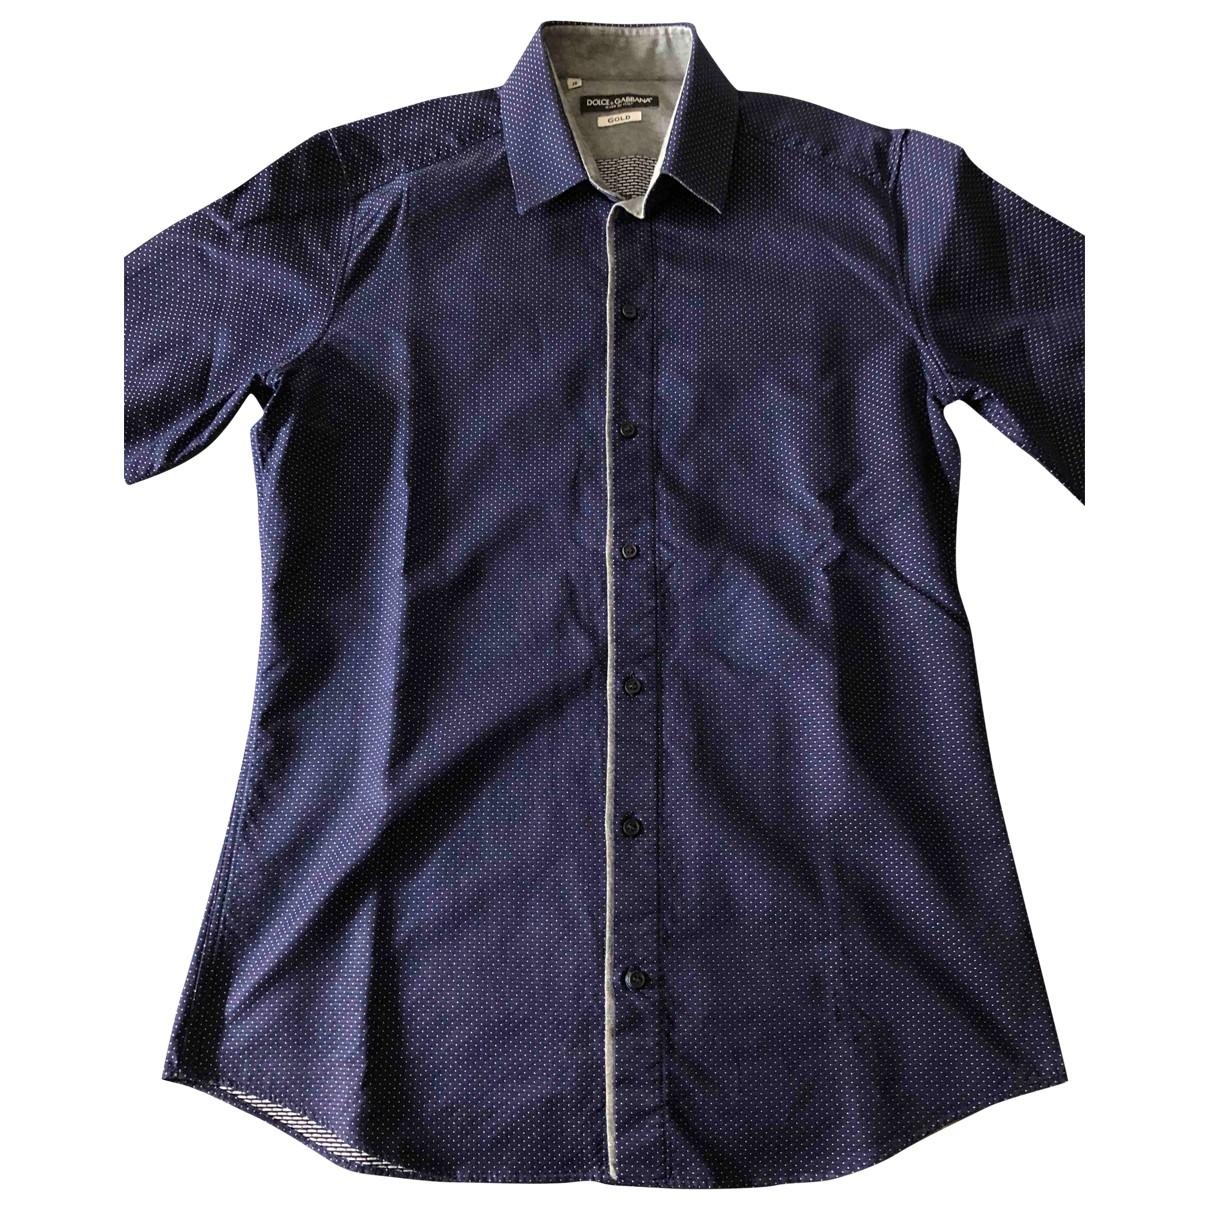 D&g \N Hemden in  Blau Baumwolle